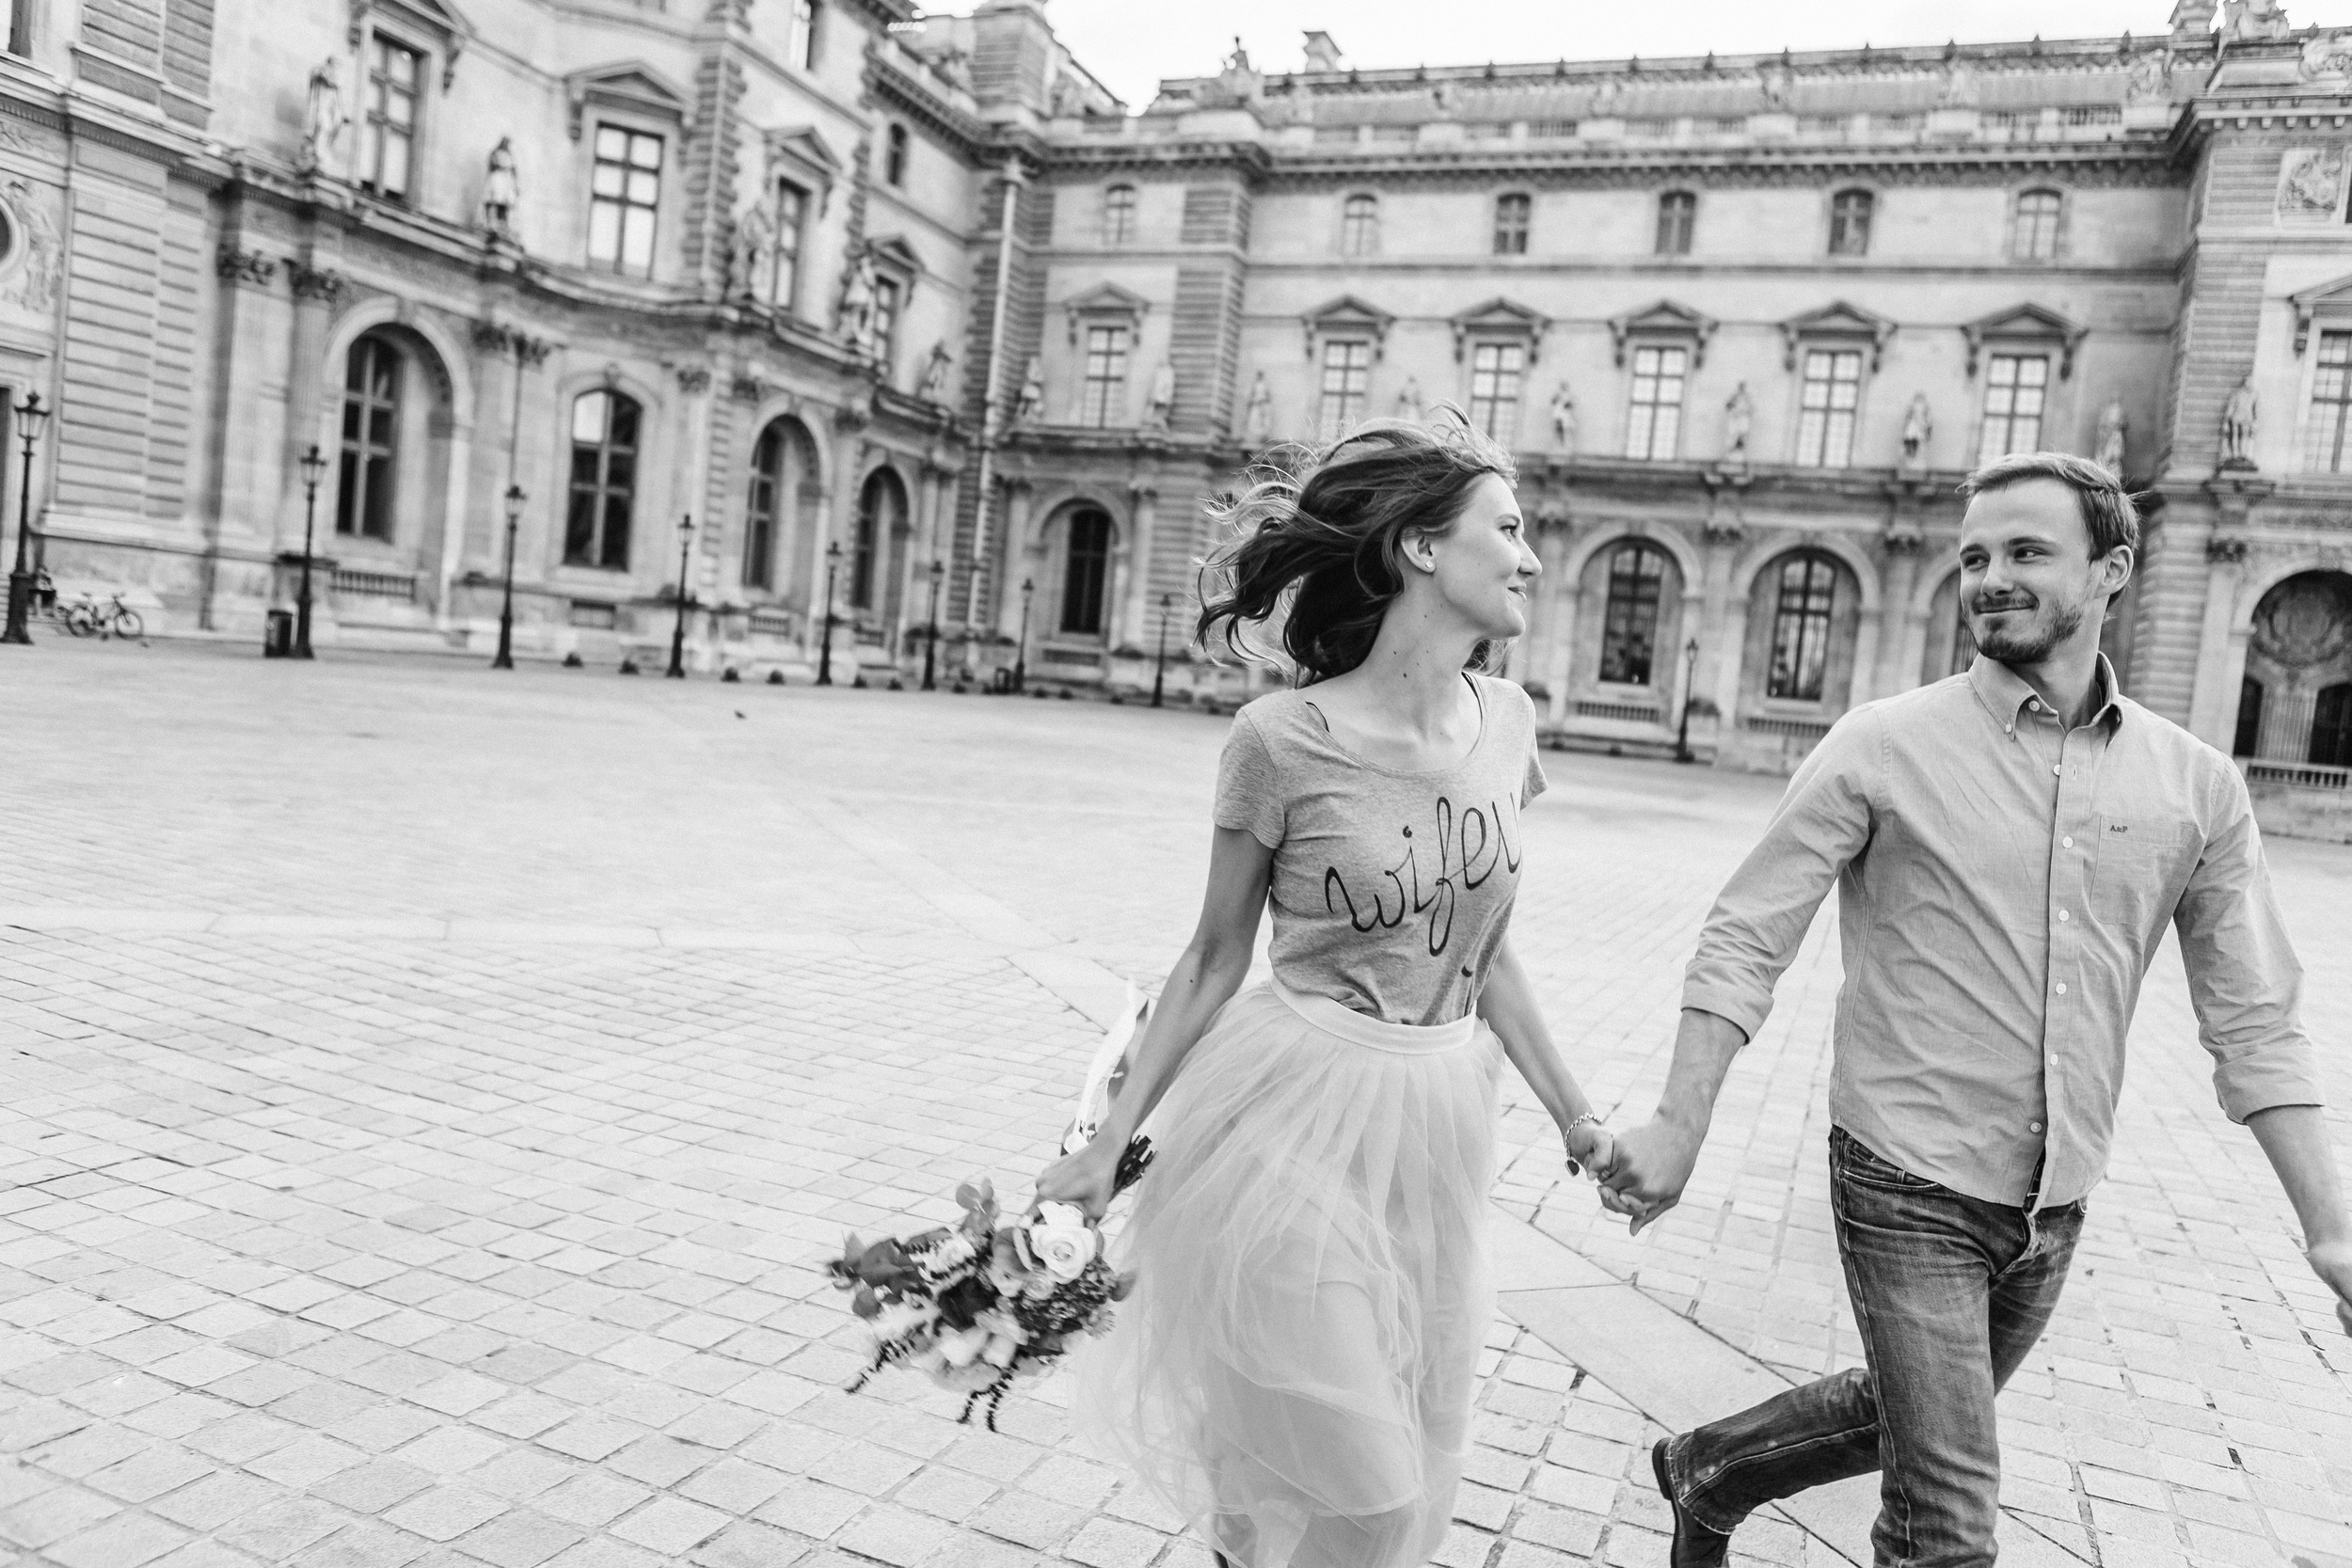 paris photographer federico guendel couple romantic honeymoon portrait session at the courtyard of louvre museum